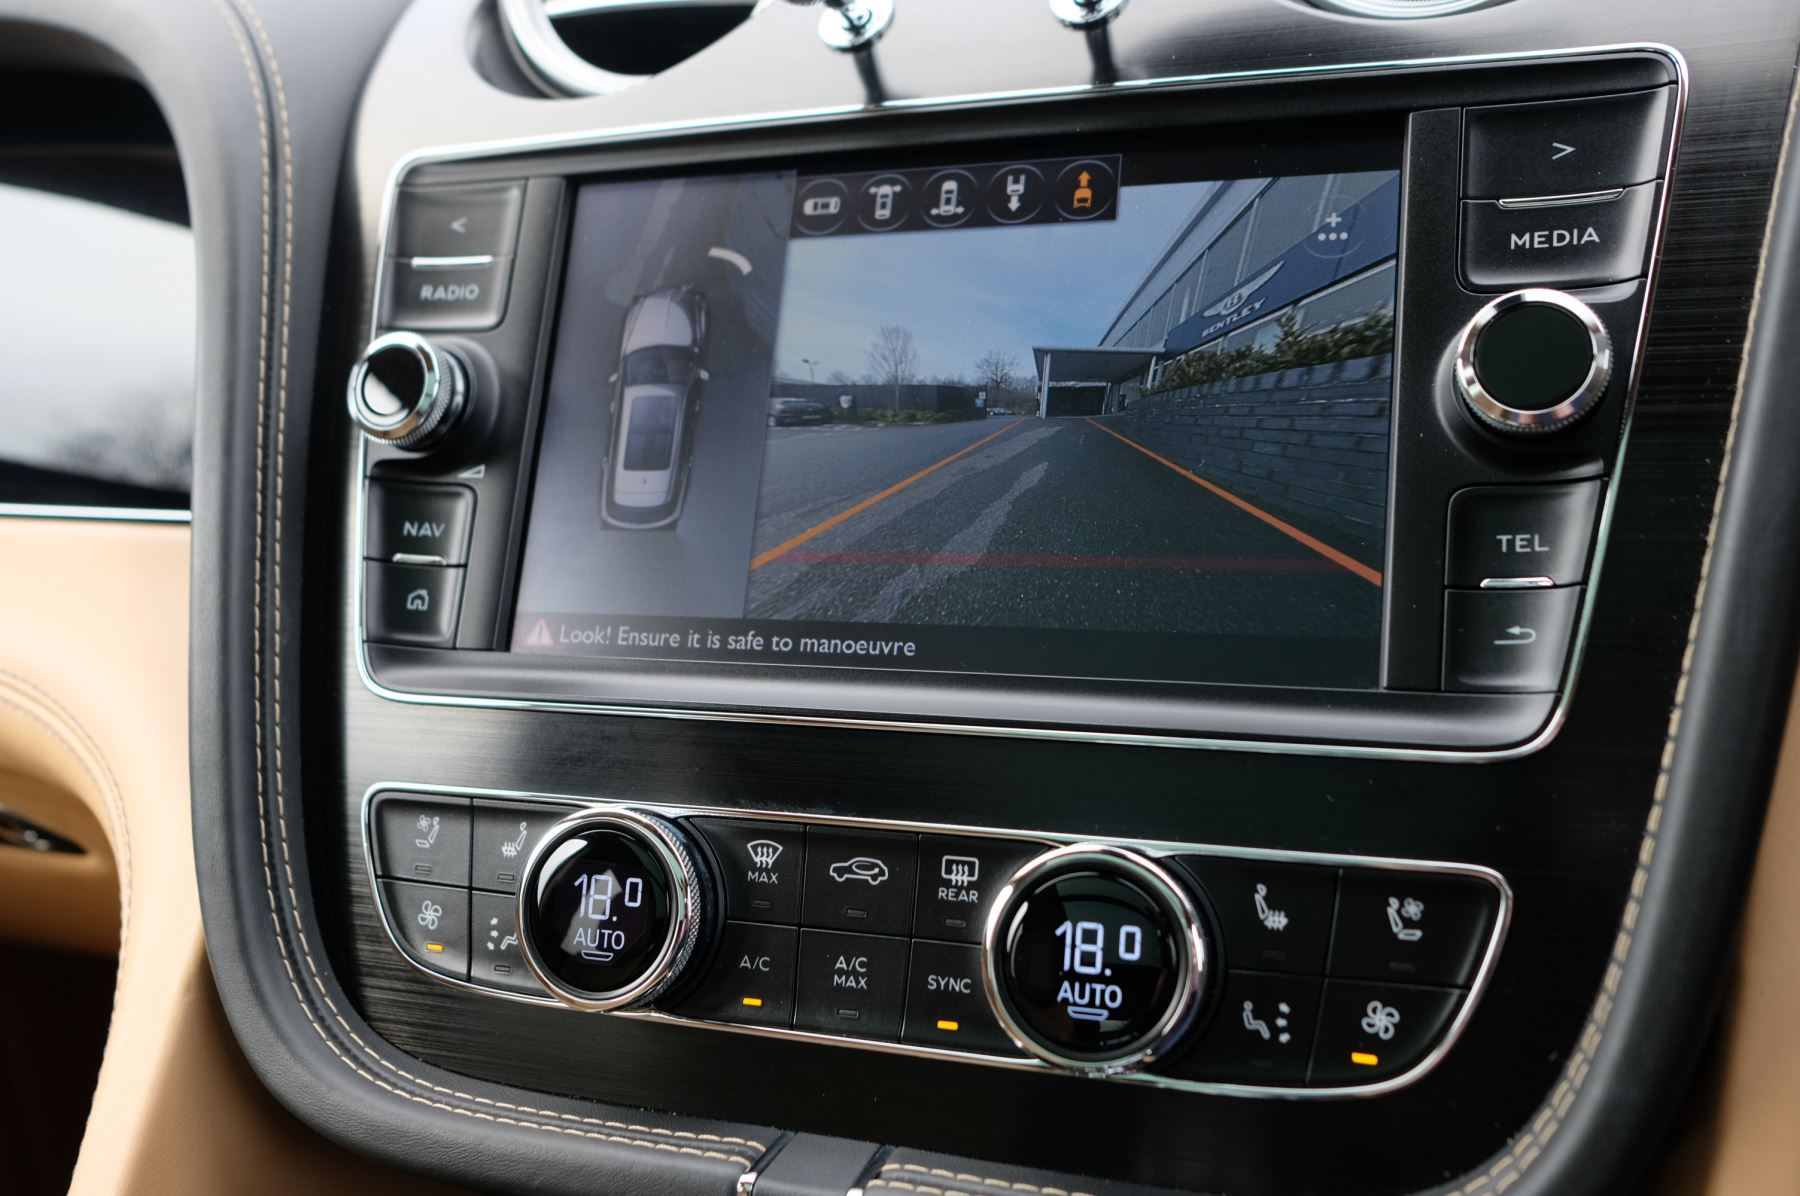 Bentley Bentayga 6.0 W12 5dr - Mulliner Driving Specification  image 22